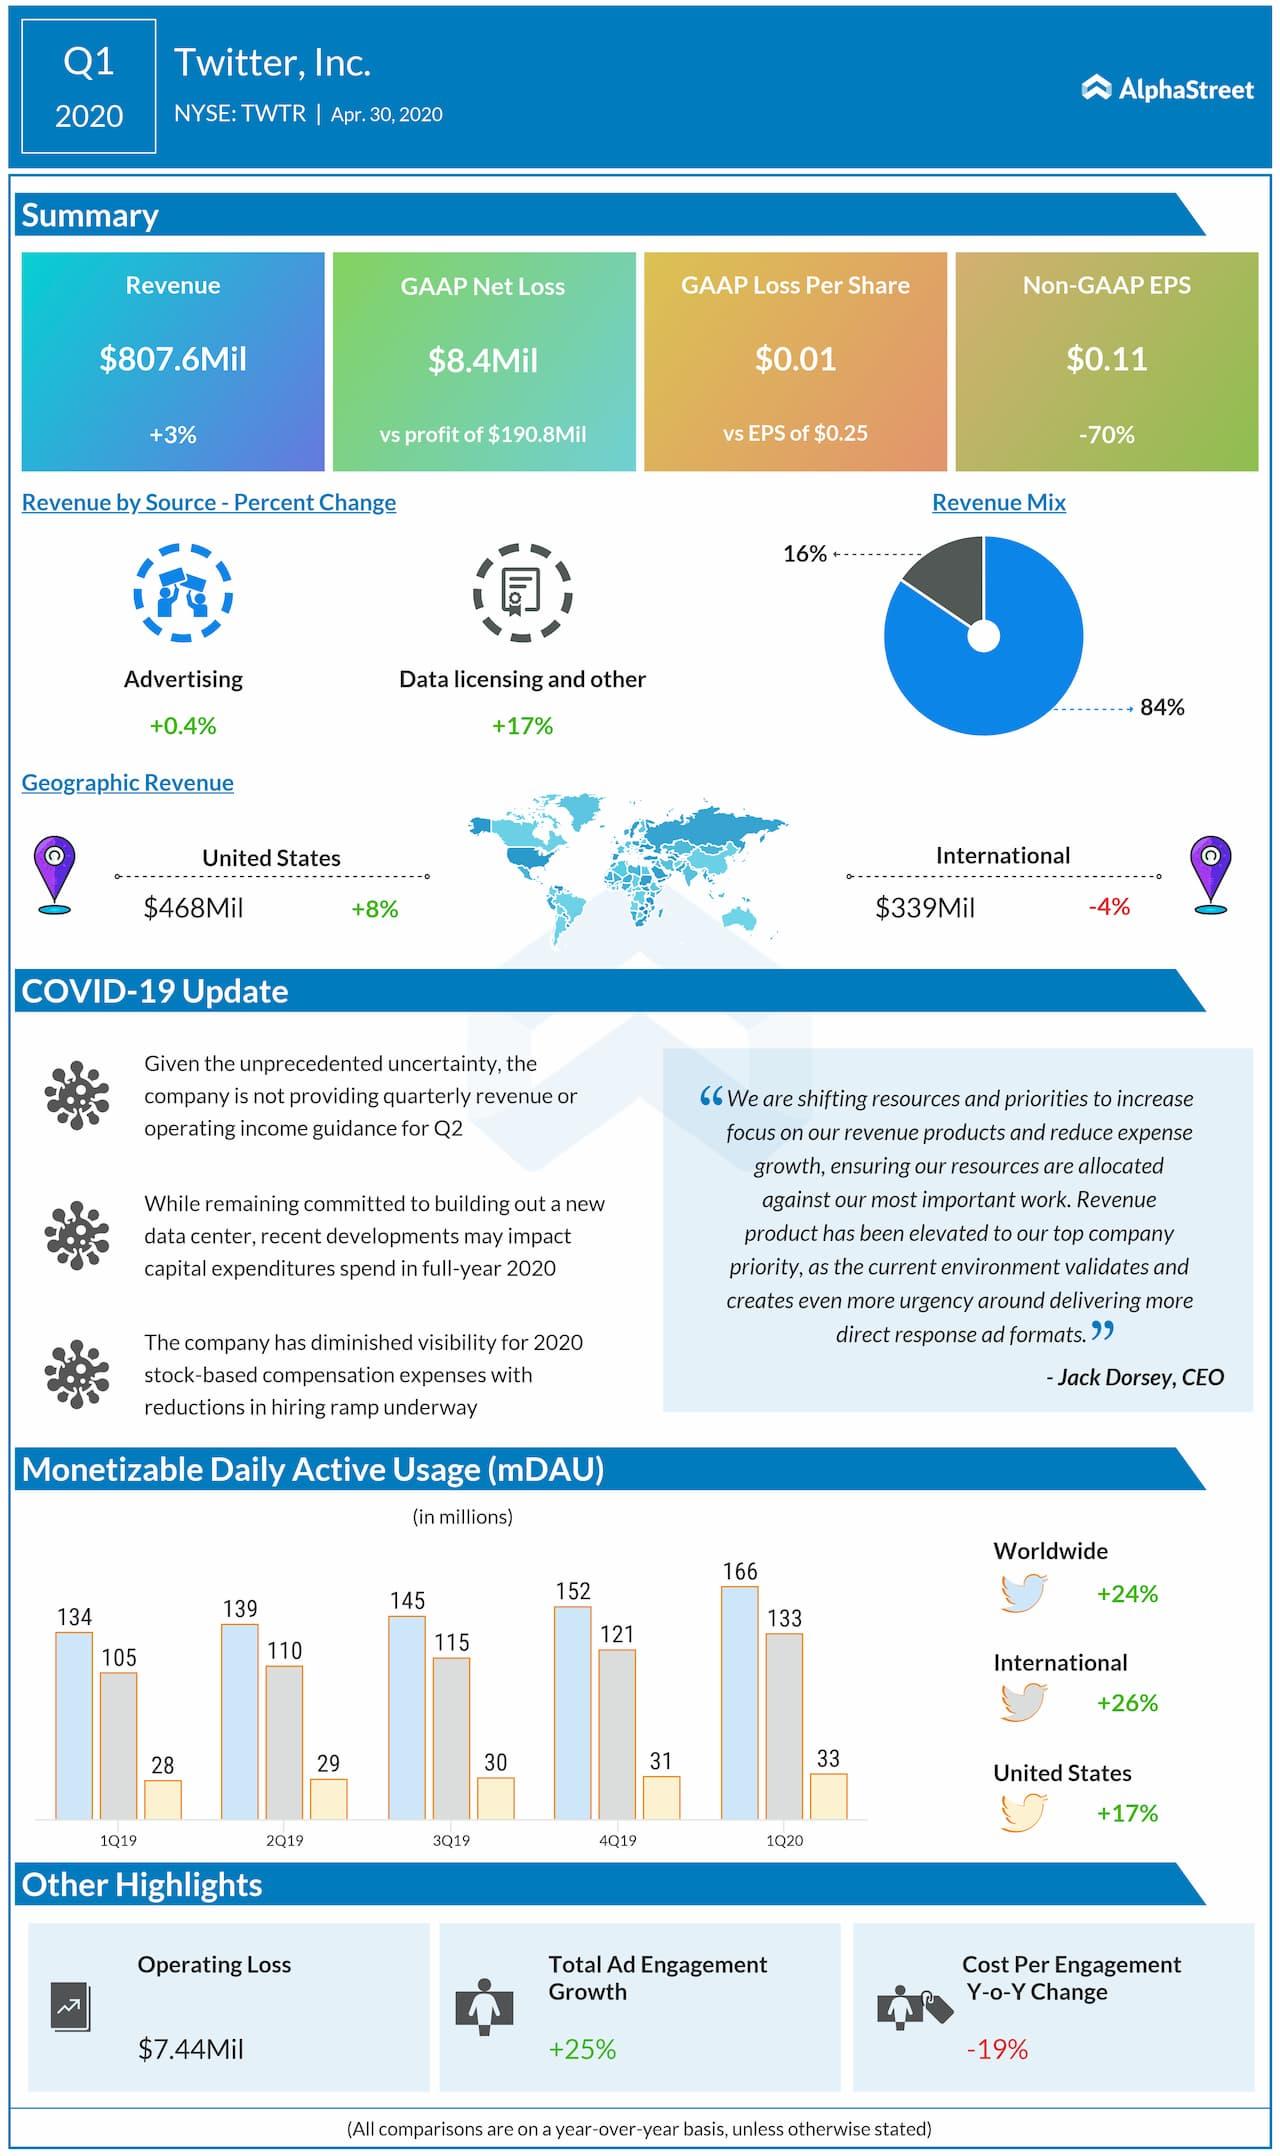 Twitter (TWTR) Q1 2020 earnings review